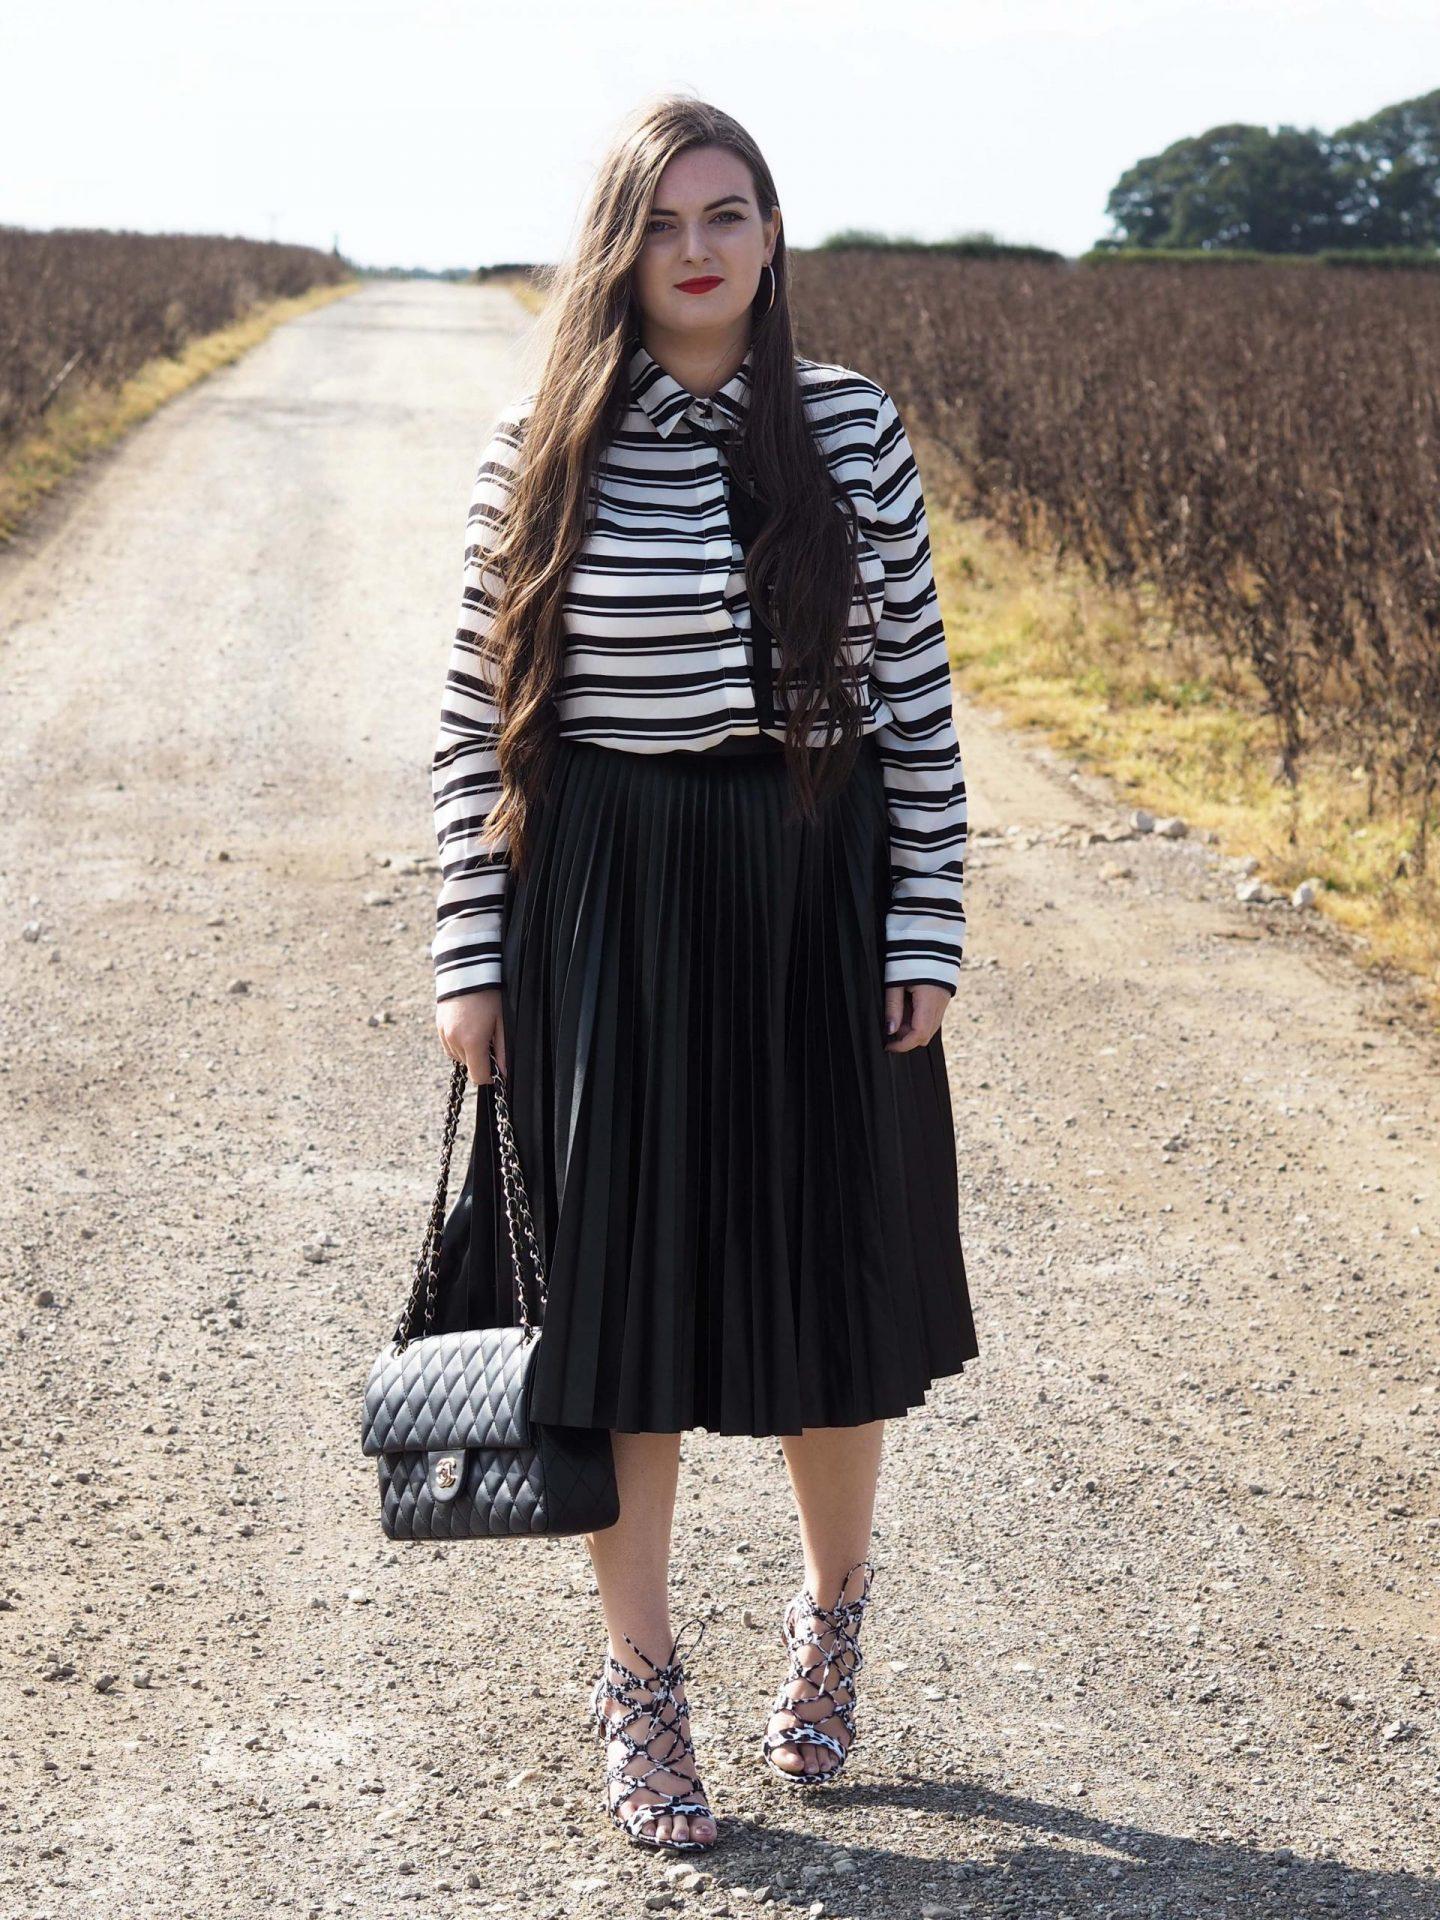 closet-leather-pleated-skirts-and-stripes-rachel-nicole-uk-blogger